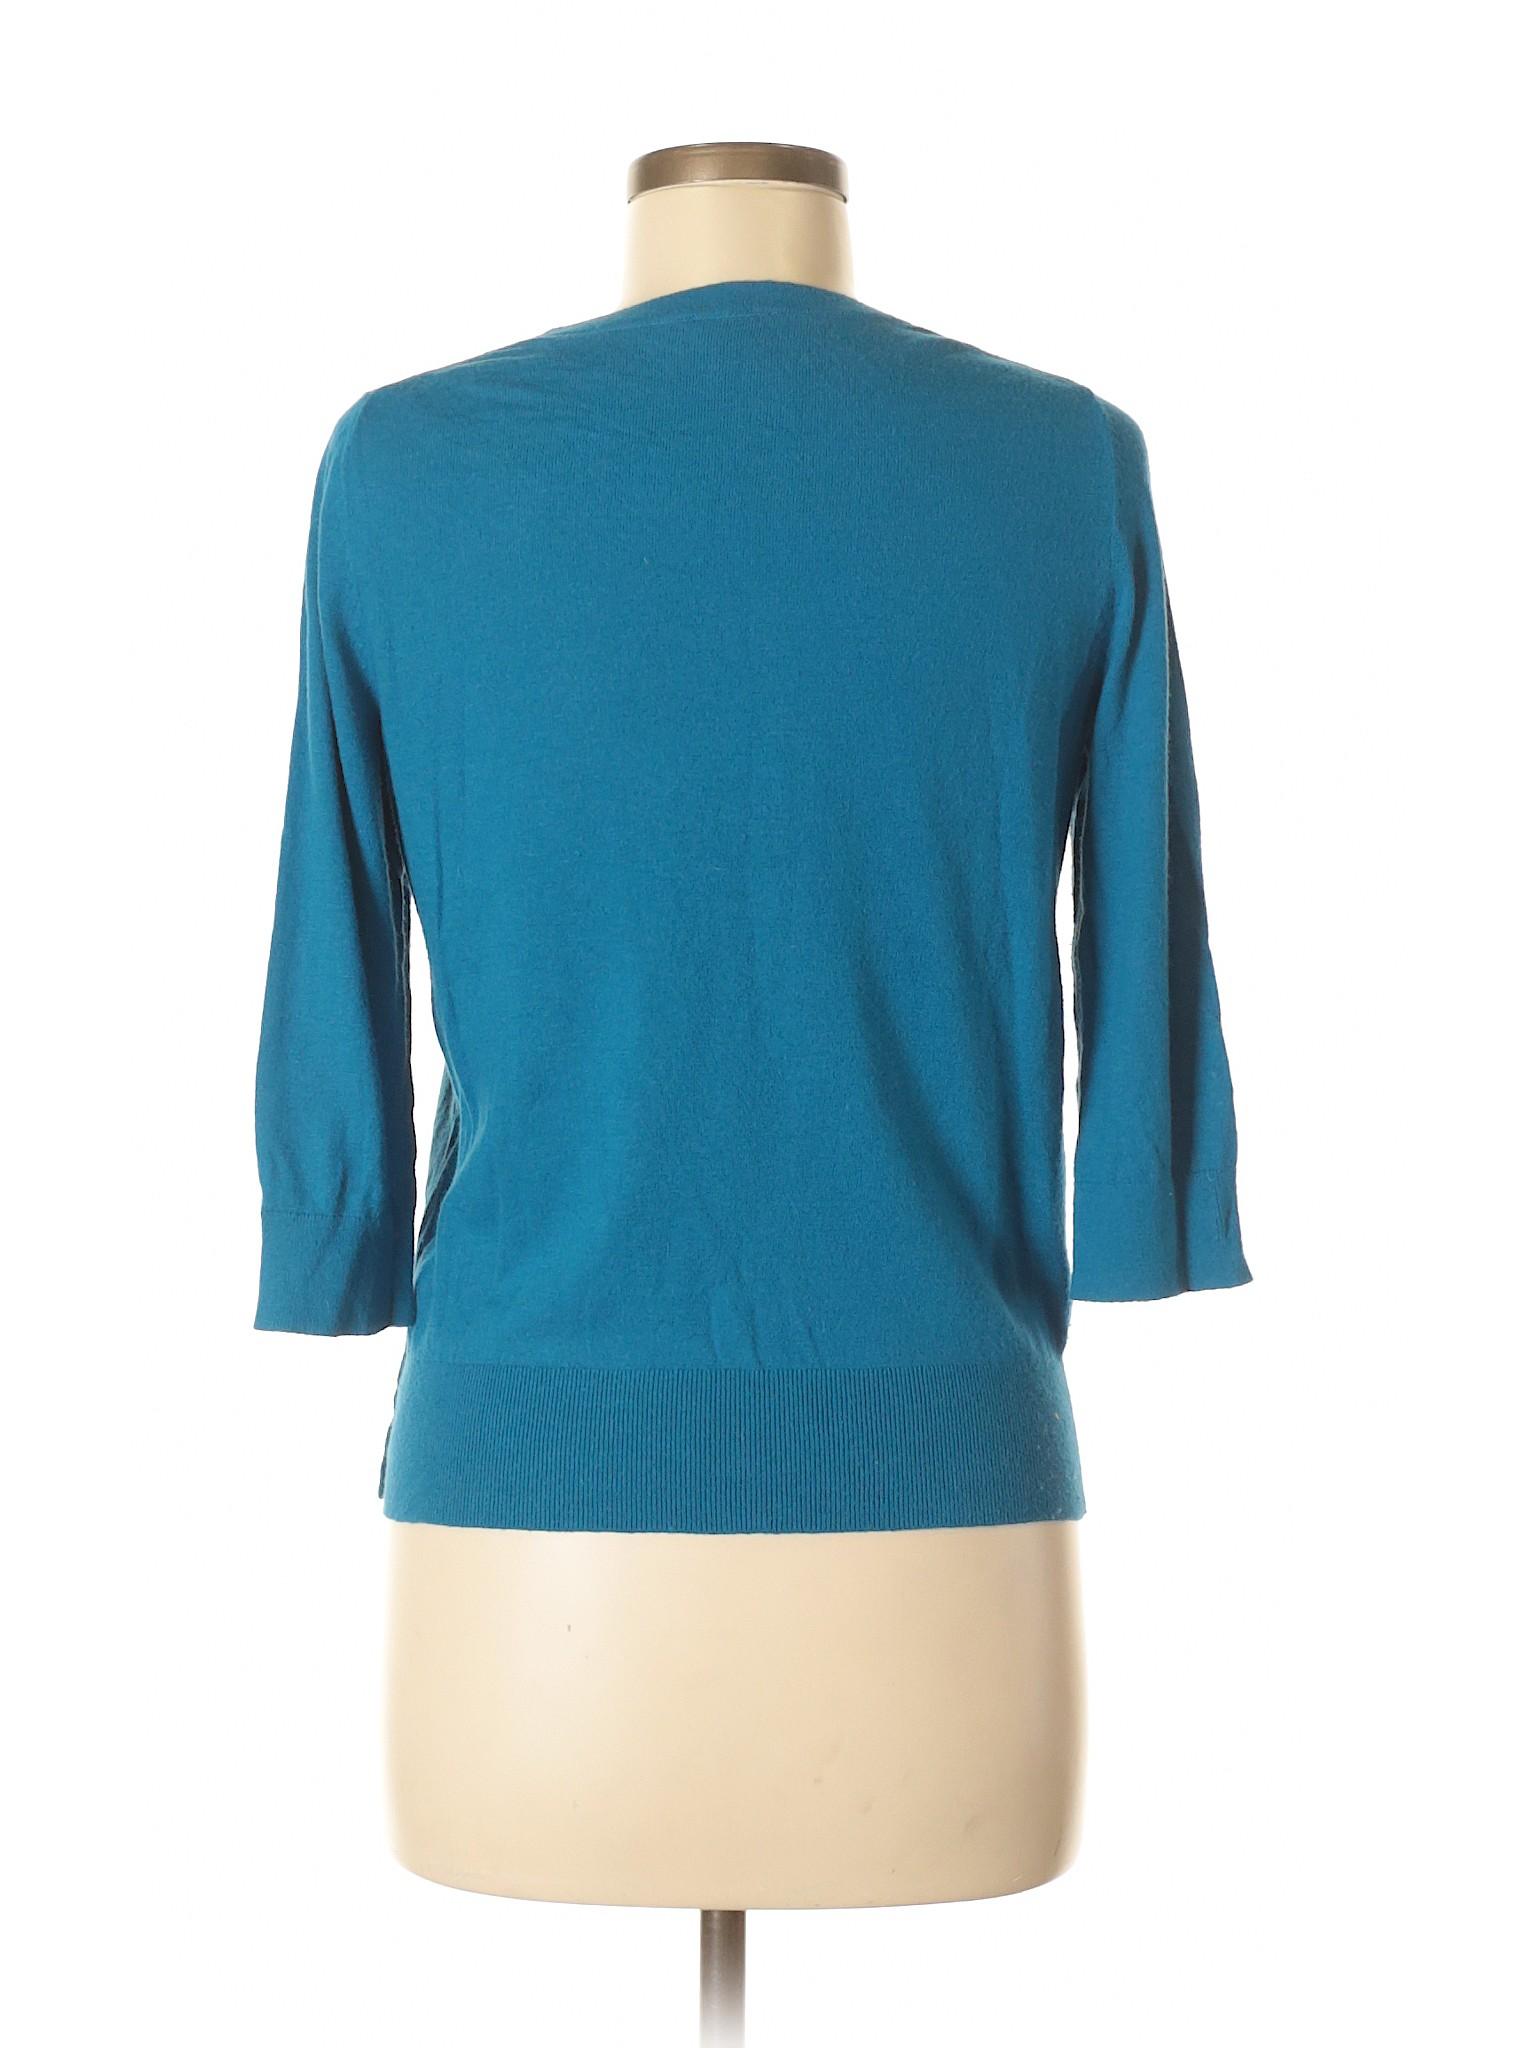 Taylor Boutique Ann Pullover winter Sweater LOFT aCqx4C